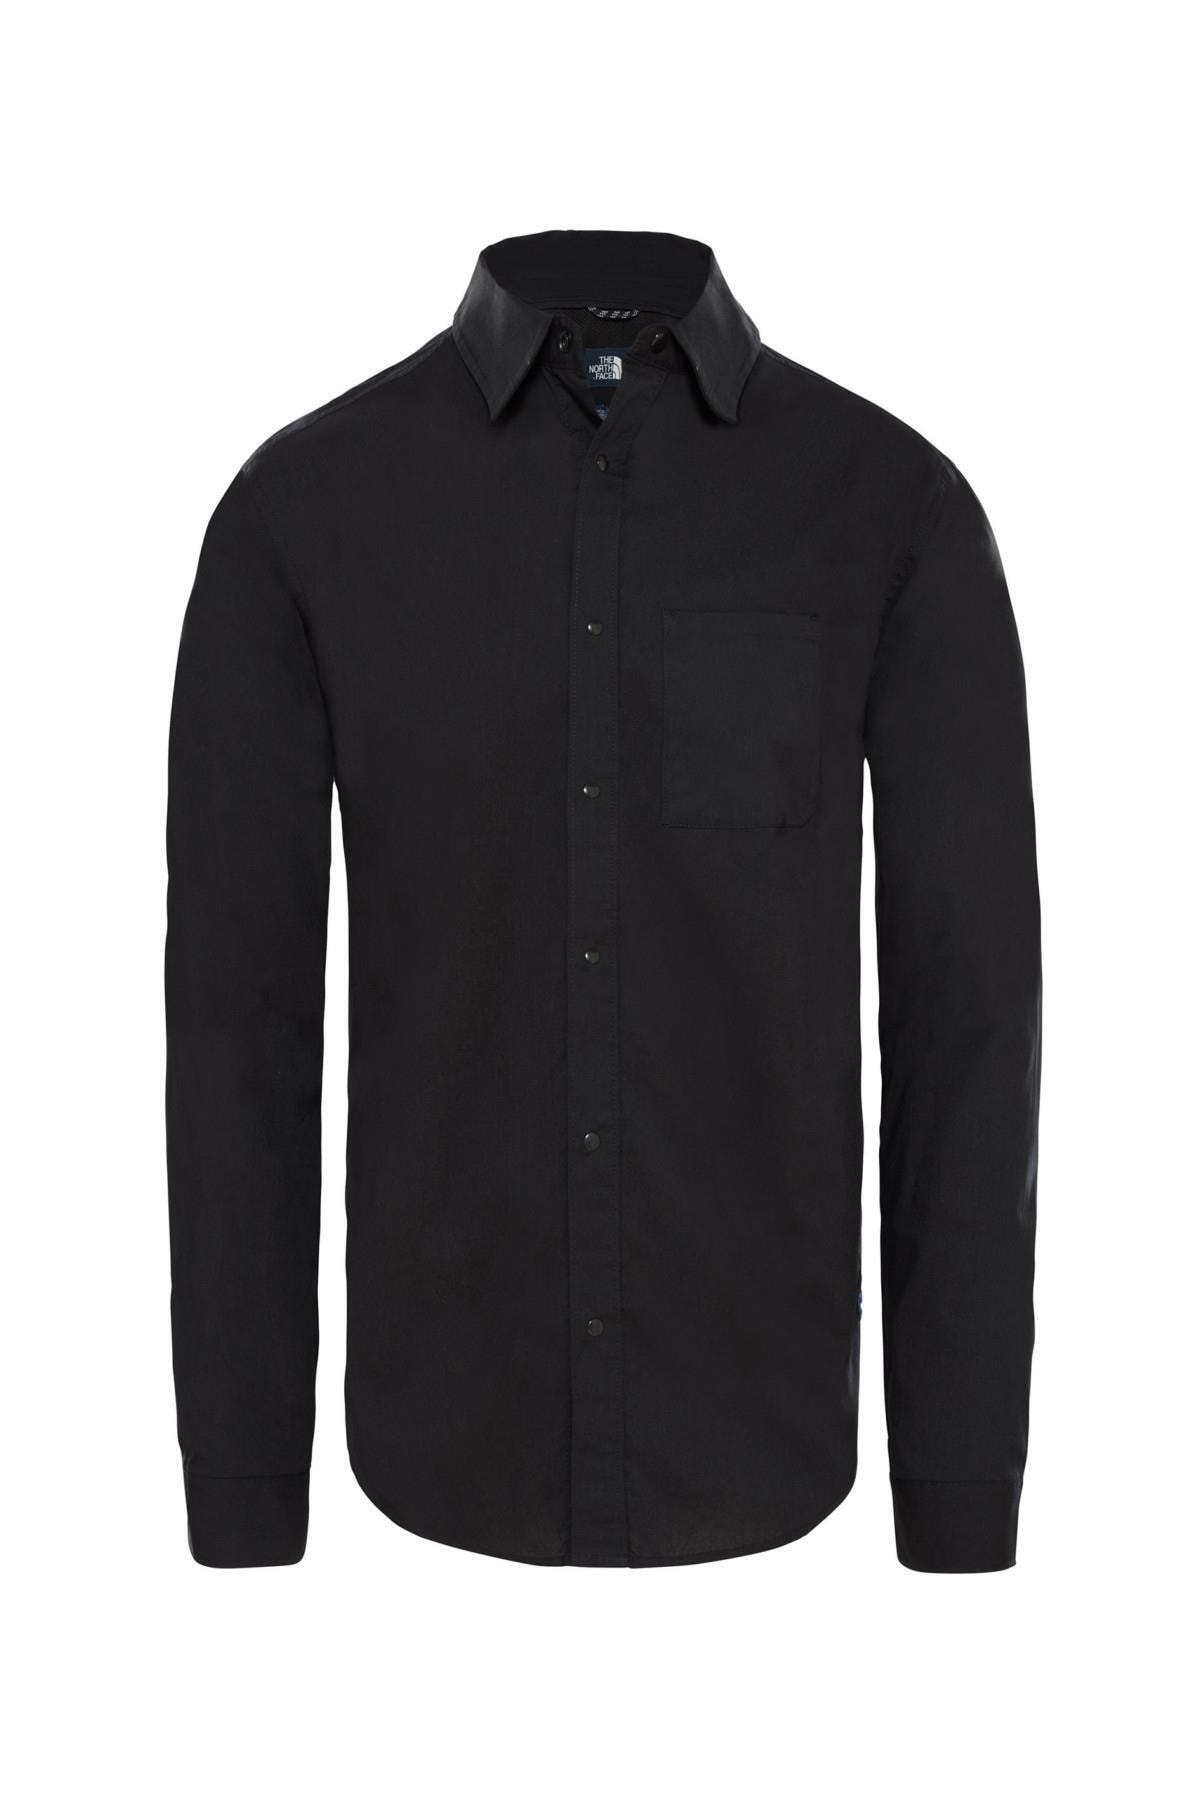 THE NORTH FACE Watkıns Erkek Gömlek Siyah 1